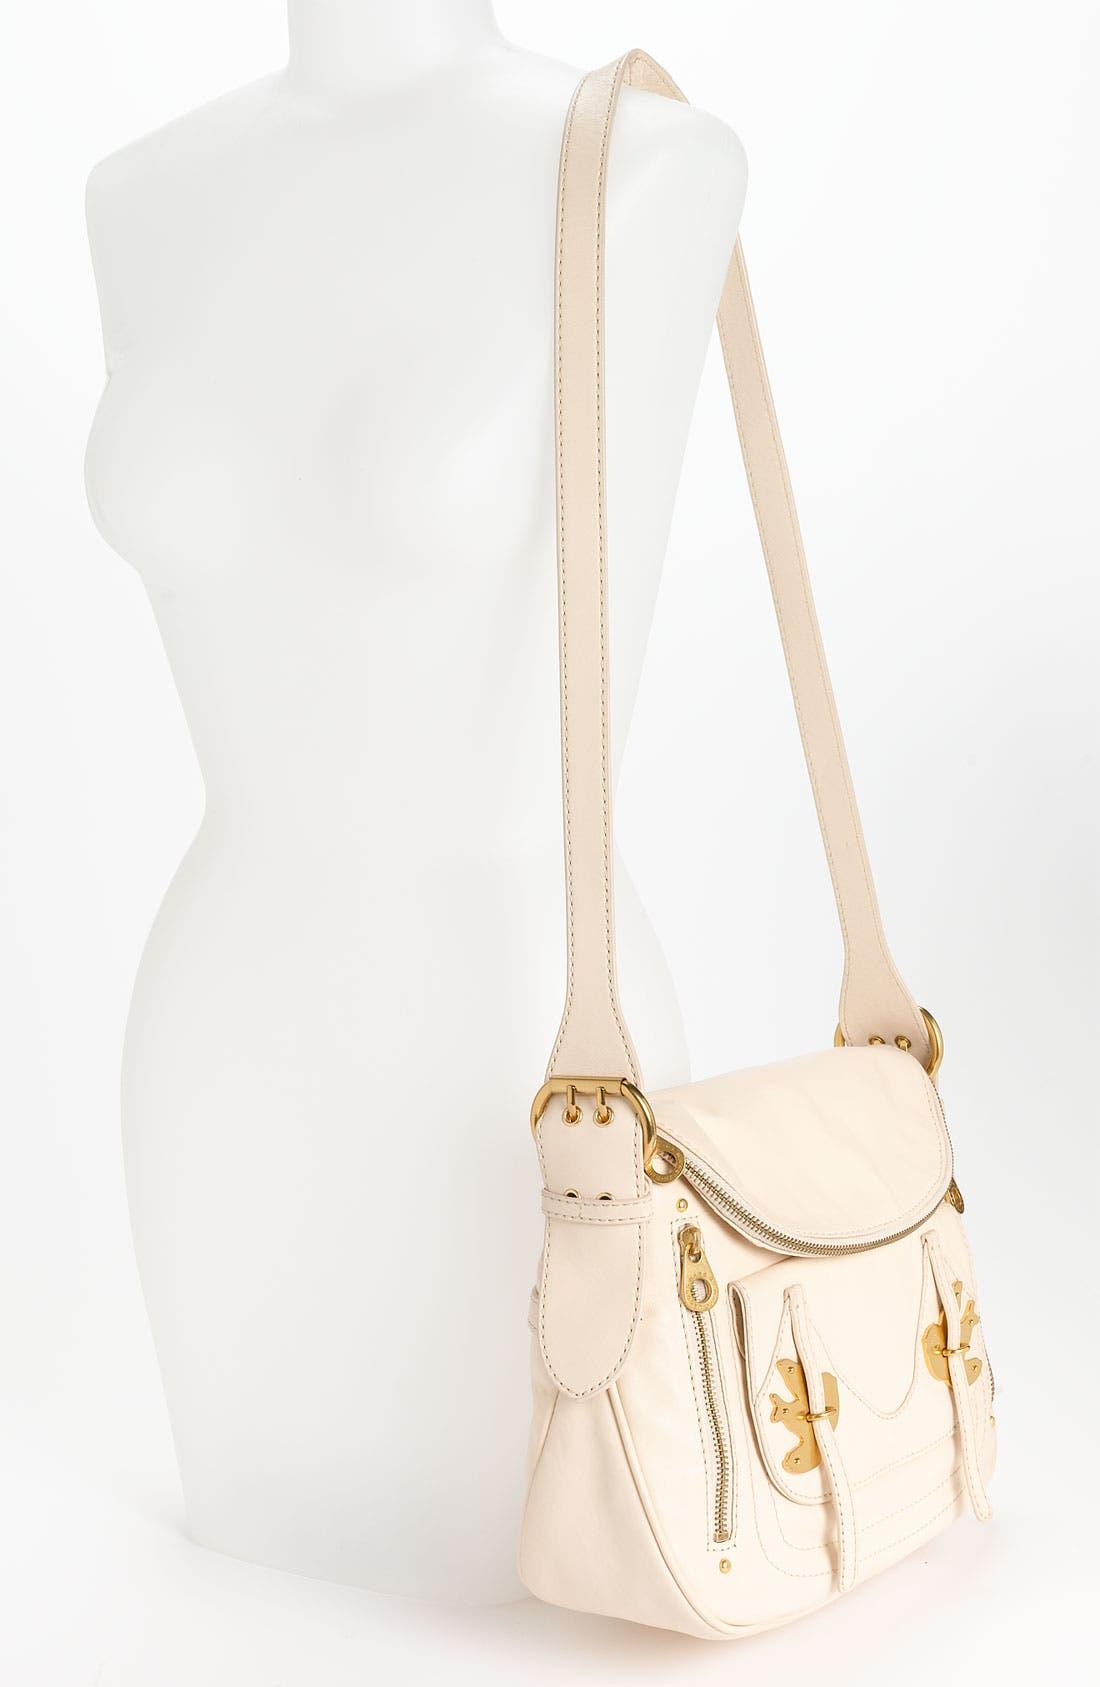 ,                             MARC BY MARC JACOBS 'Petal to the Metal - Natasha' Flap Crossbody Bag, Medium,                             Alternate thumbnail 26, color,                             123